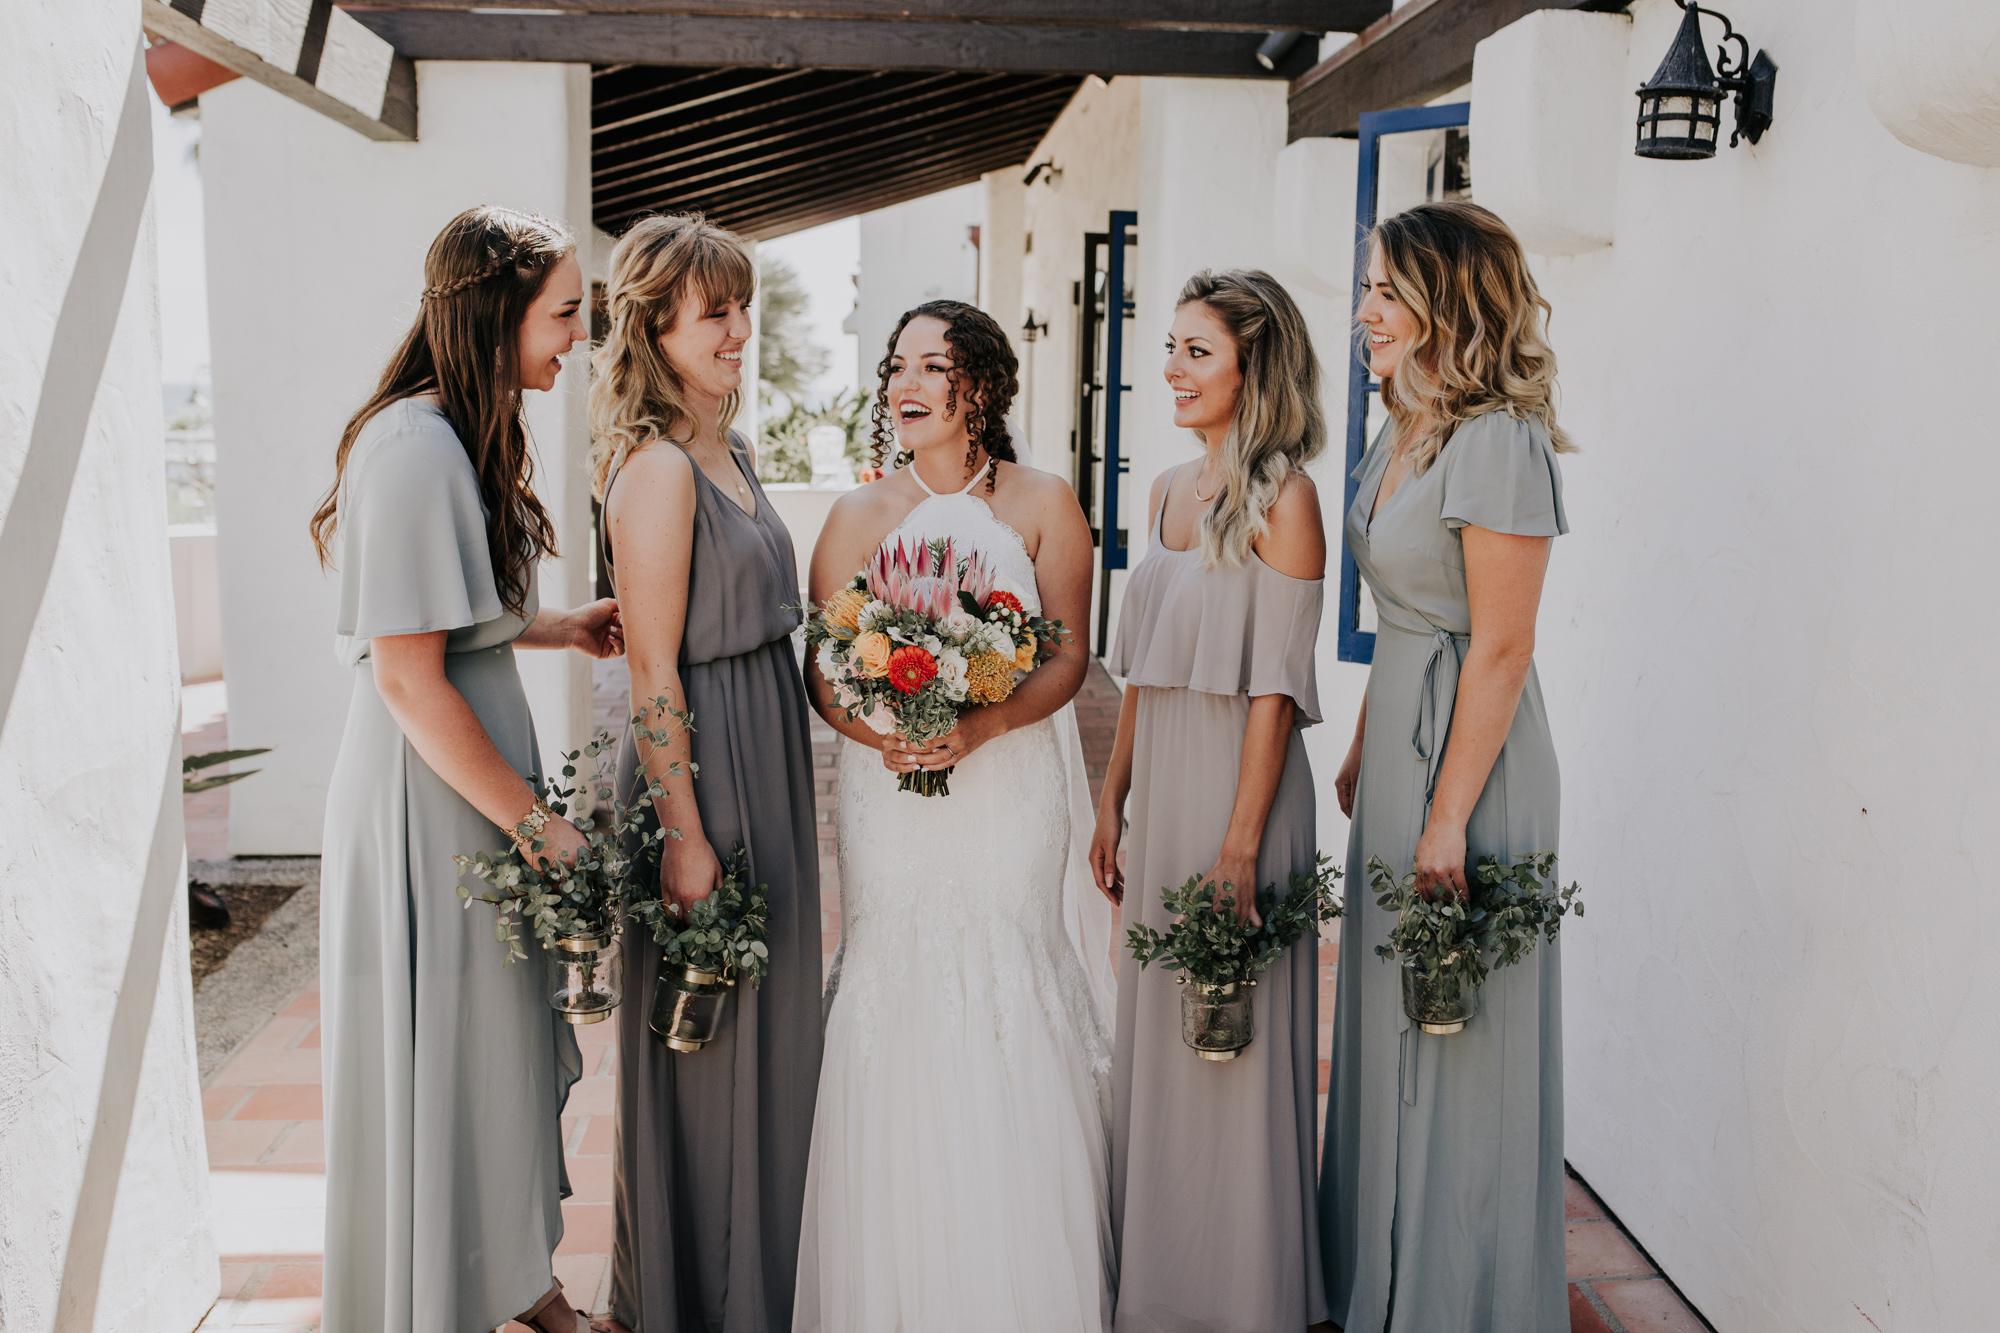 064-destination-wedding-san-clemente-california.jpg